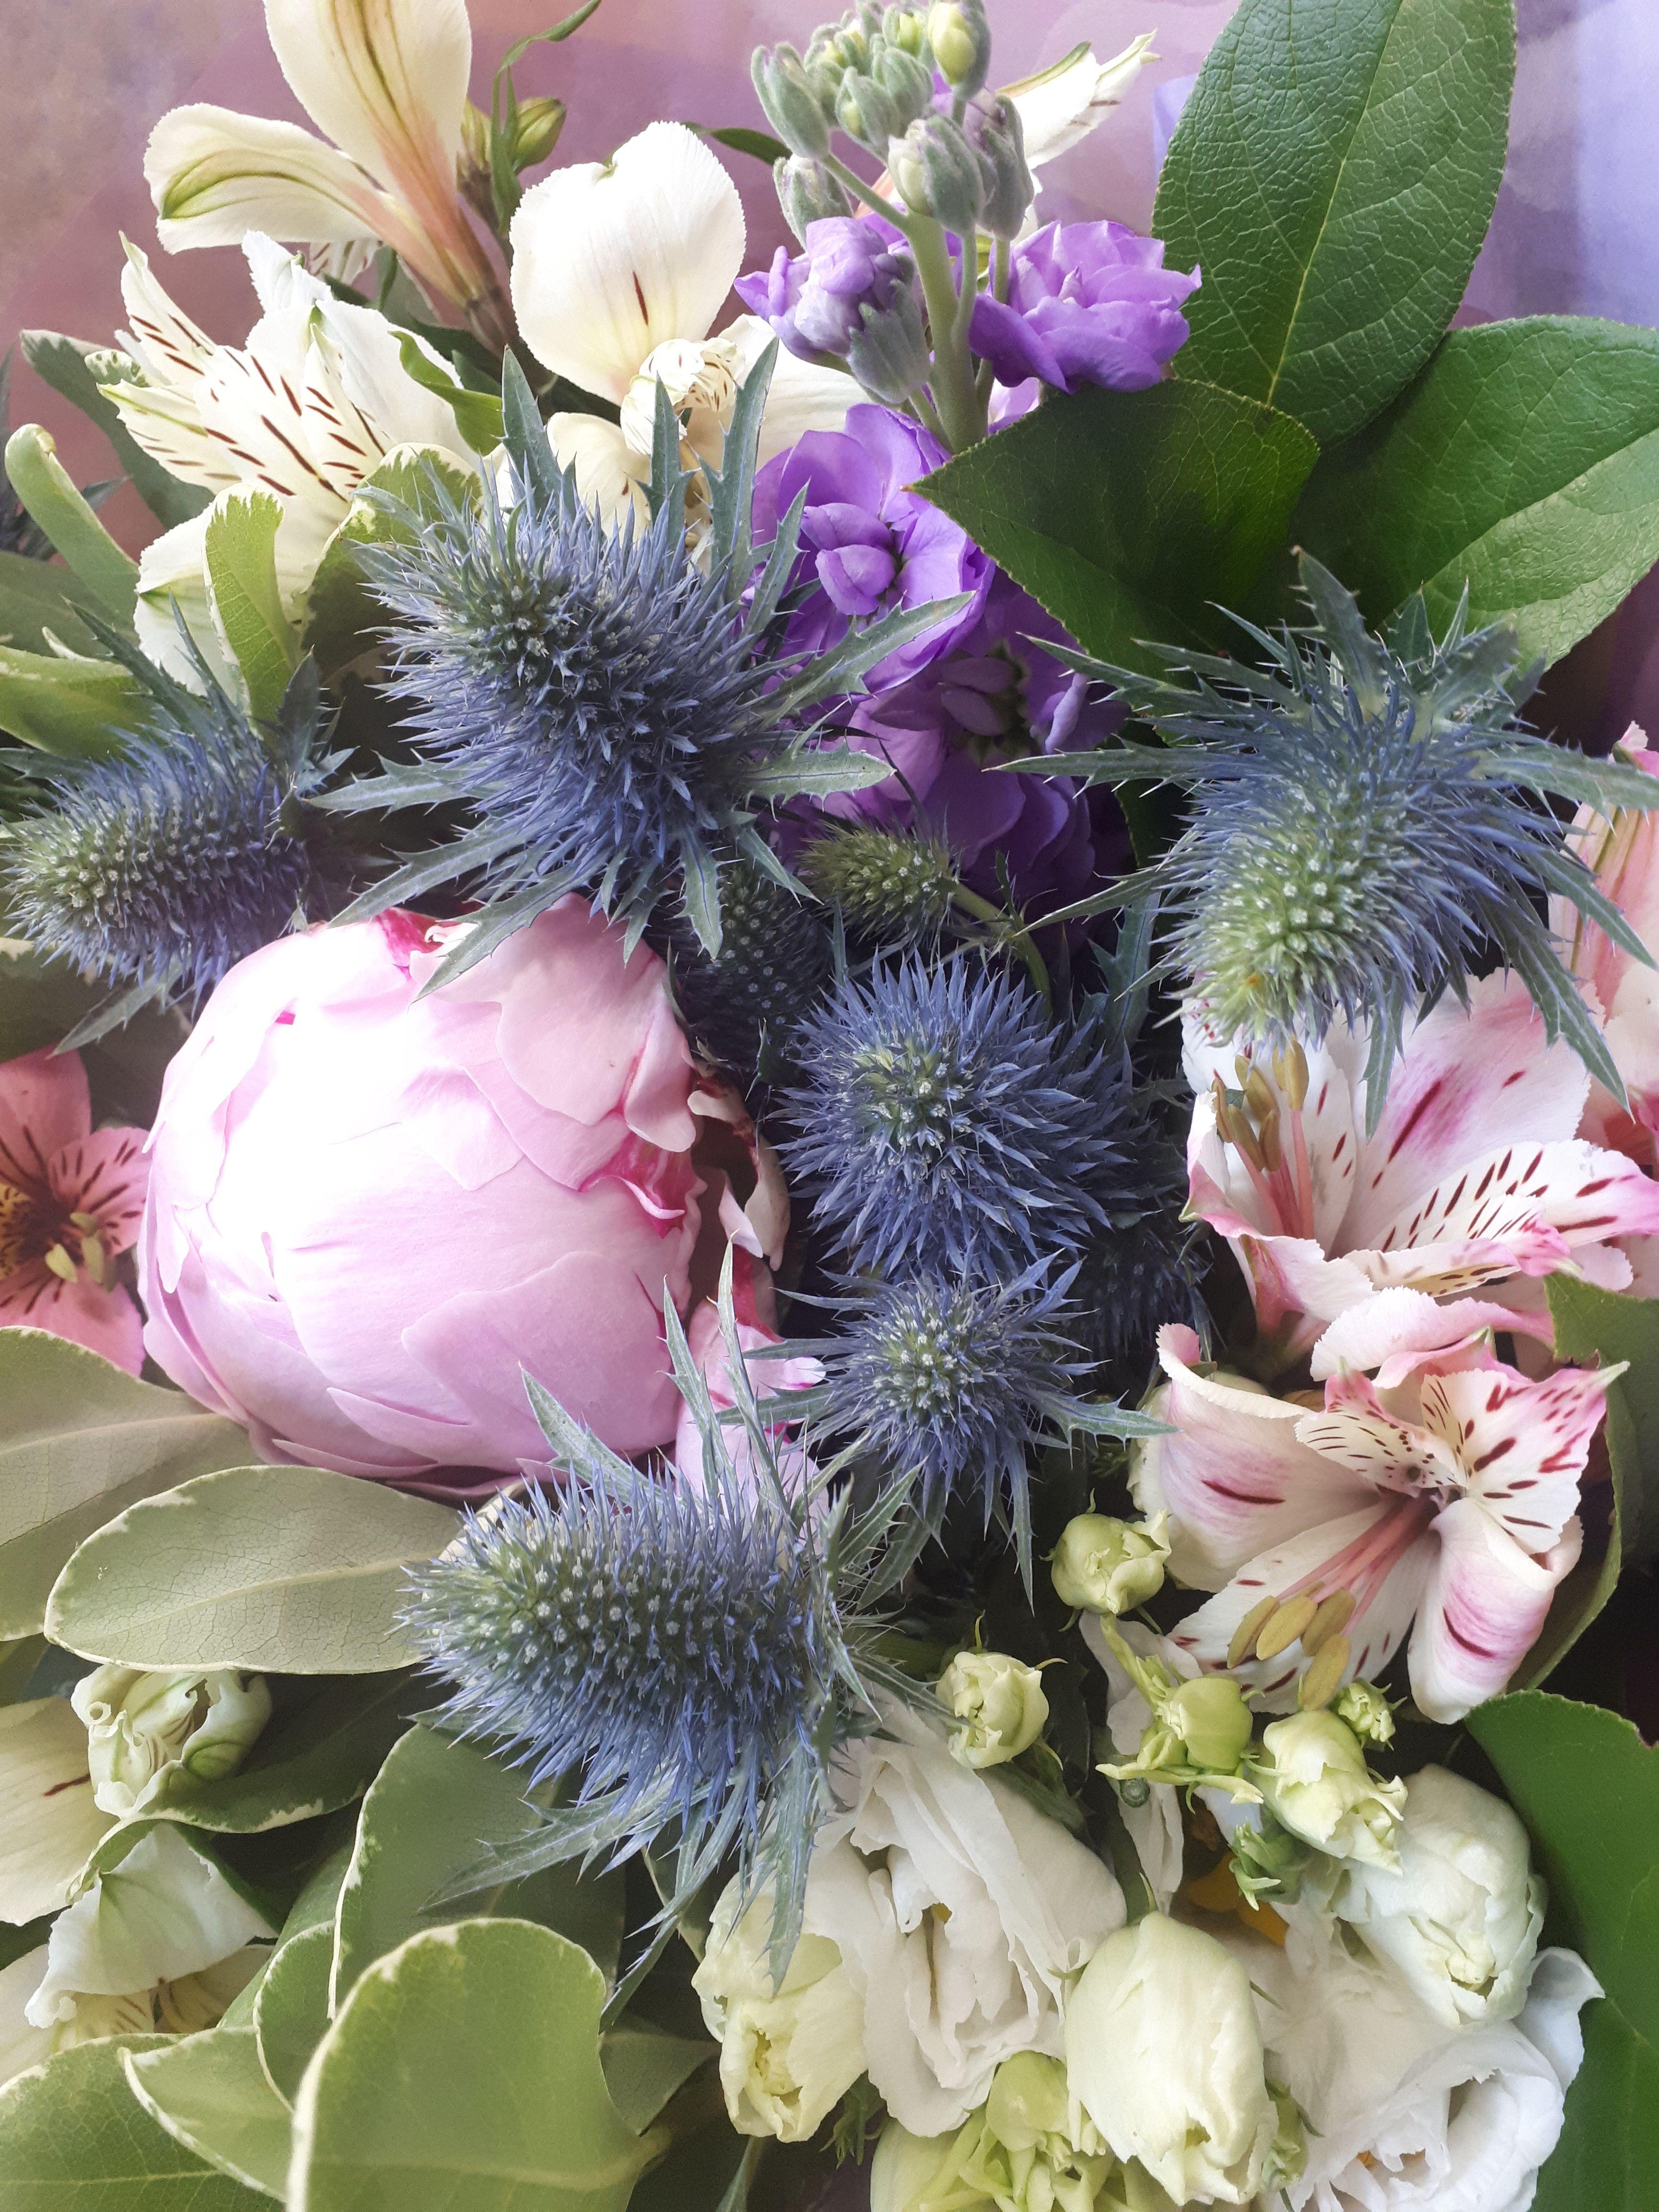 Scented bouquet of thistle, peony, lisianthus, alstromeria